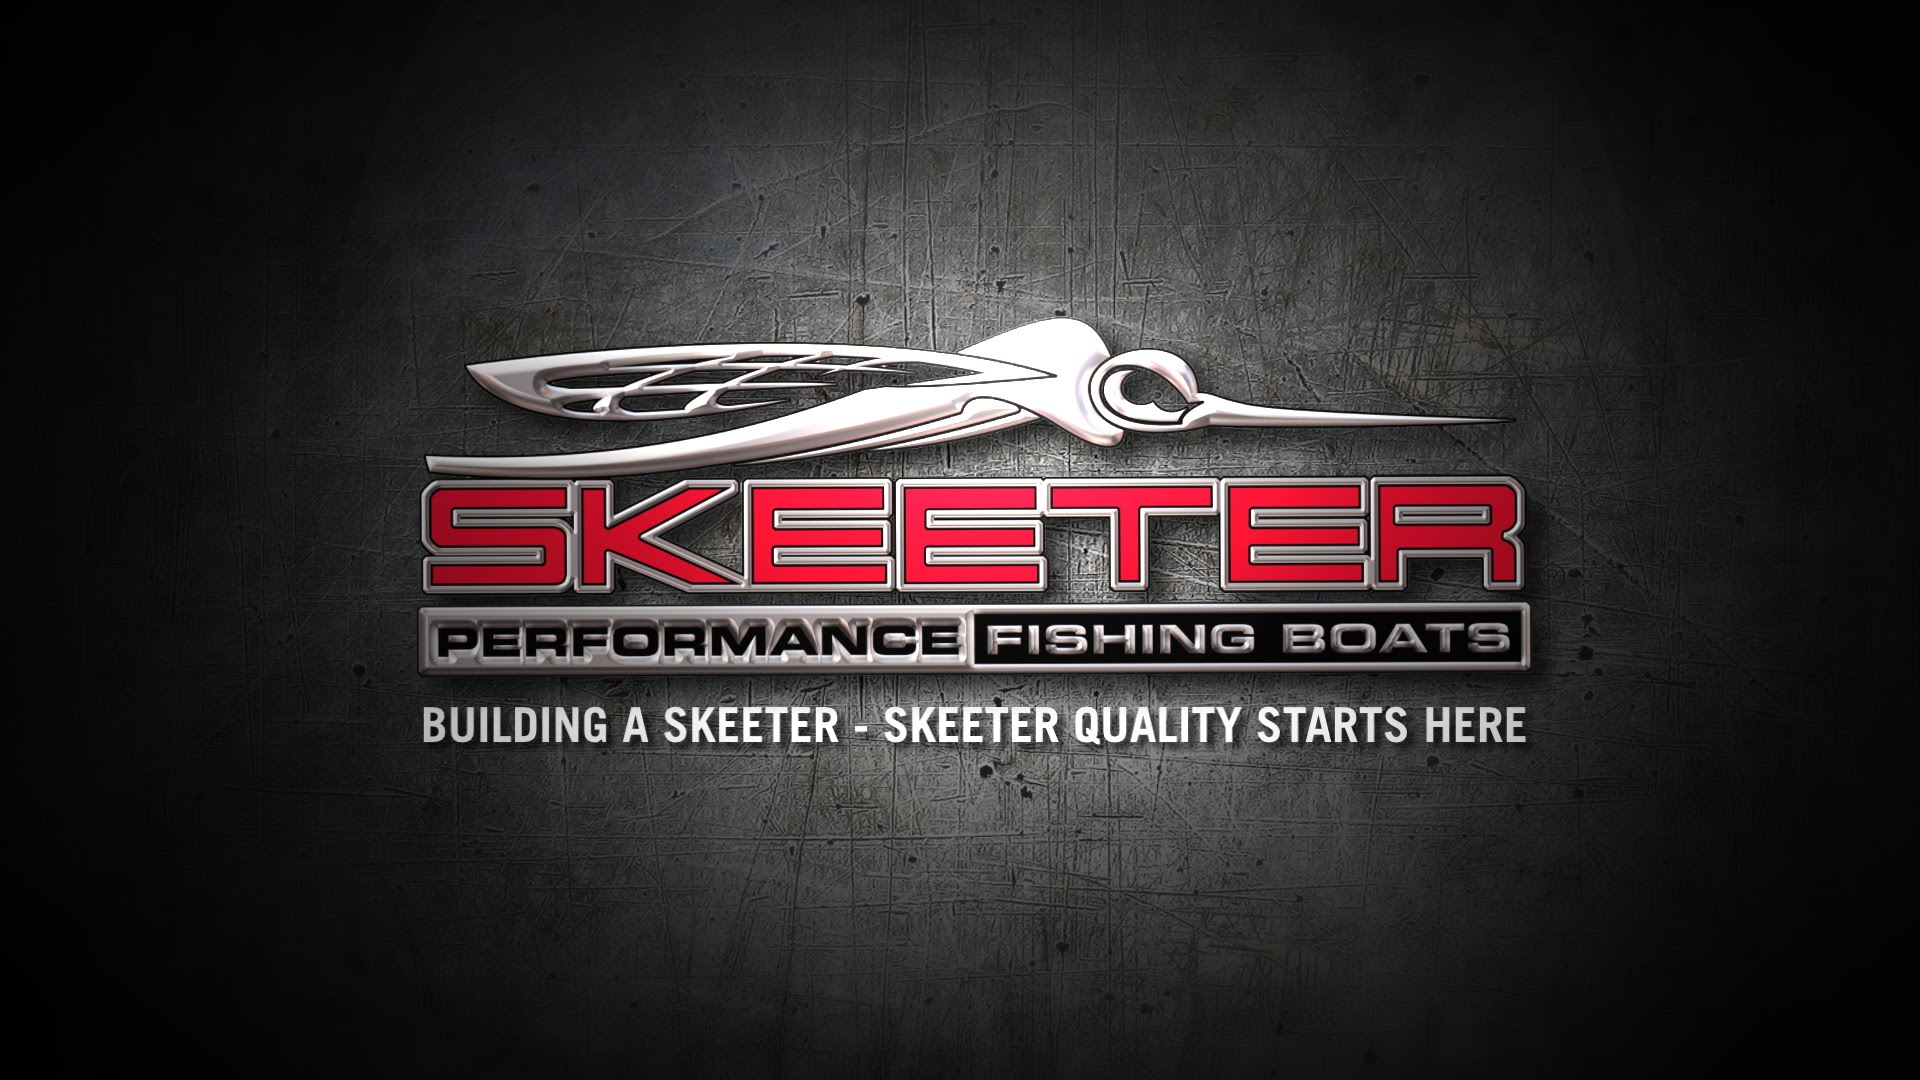 Best 60 Skeeter Wallpaper on HipWallpaper Skeeter Wallpaper 1920x1080